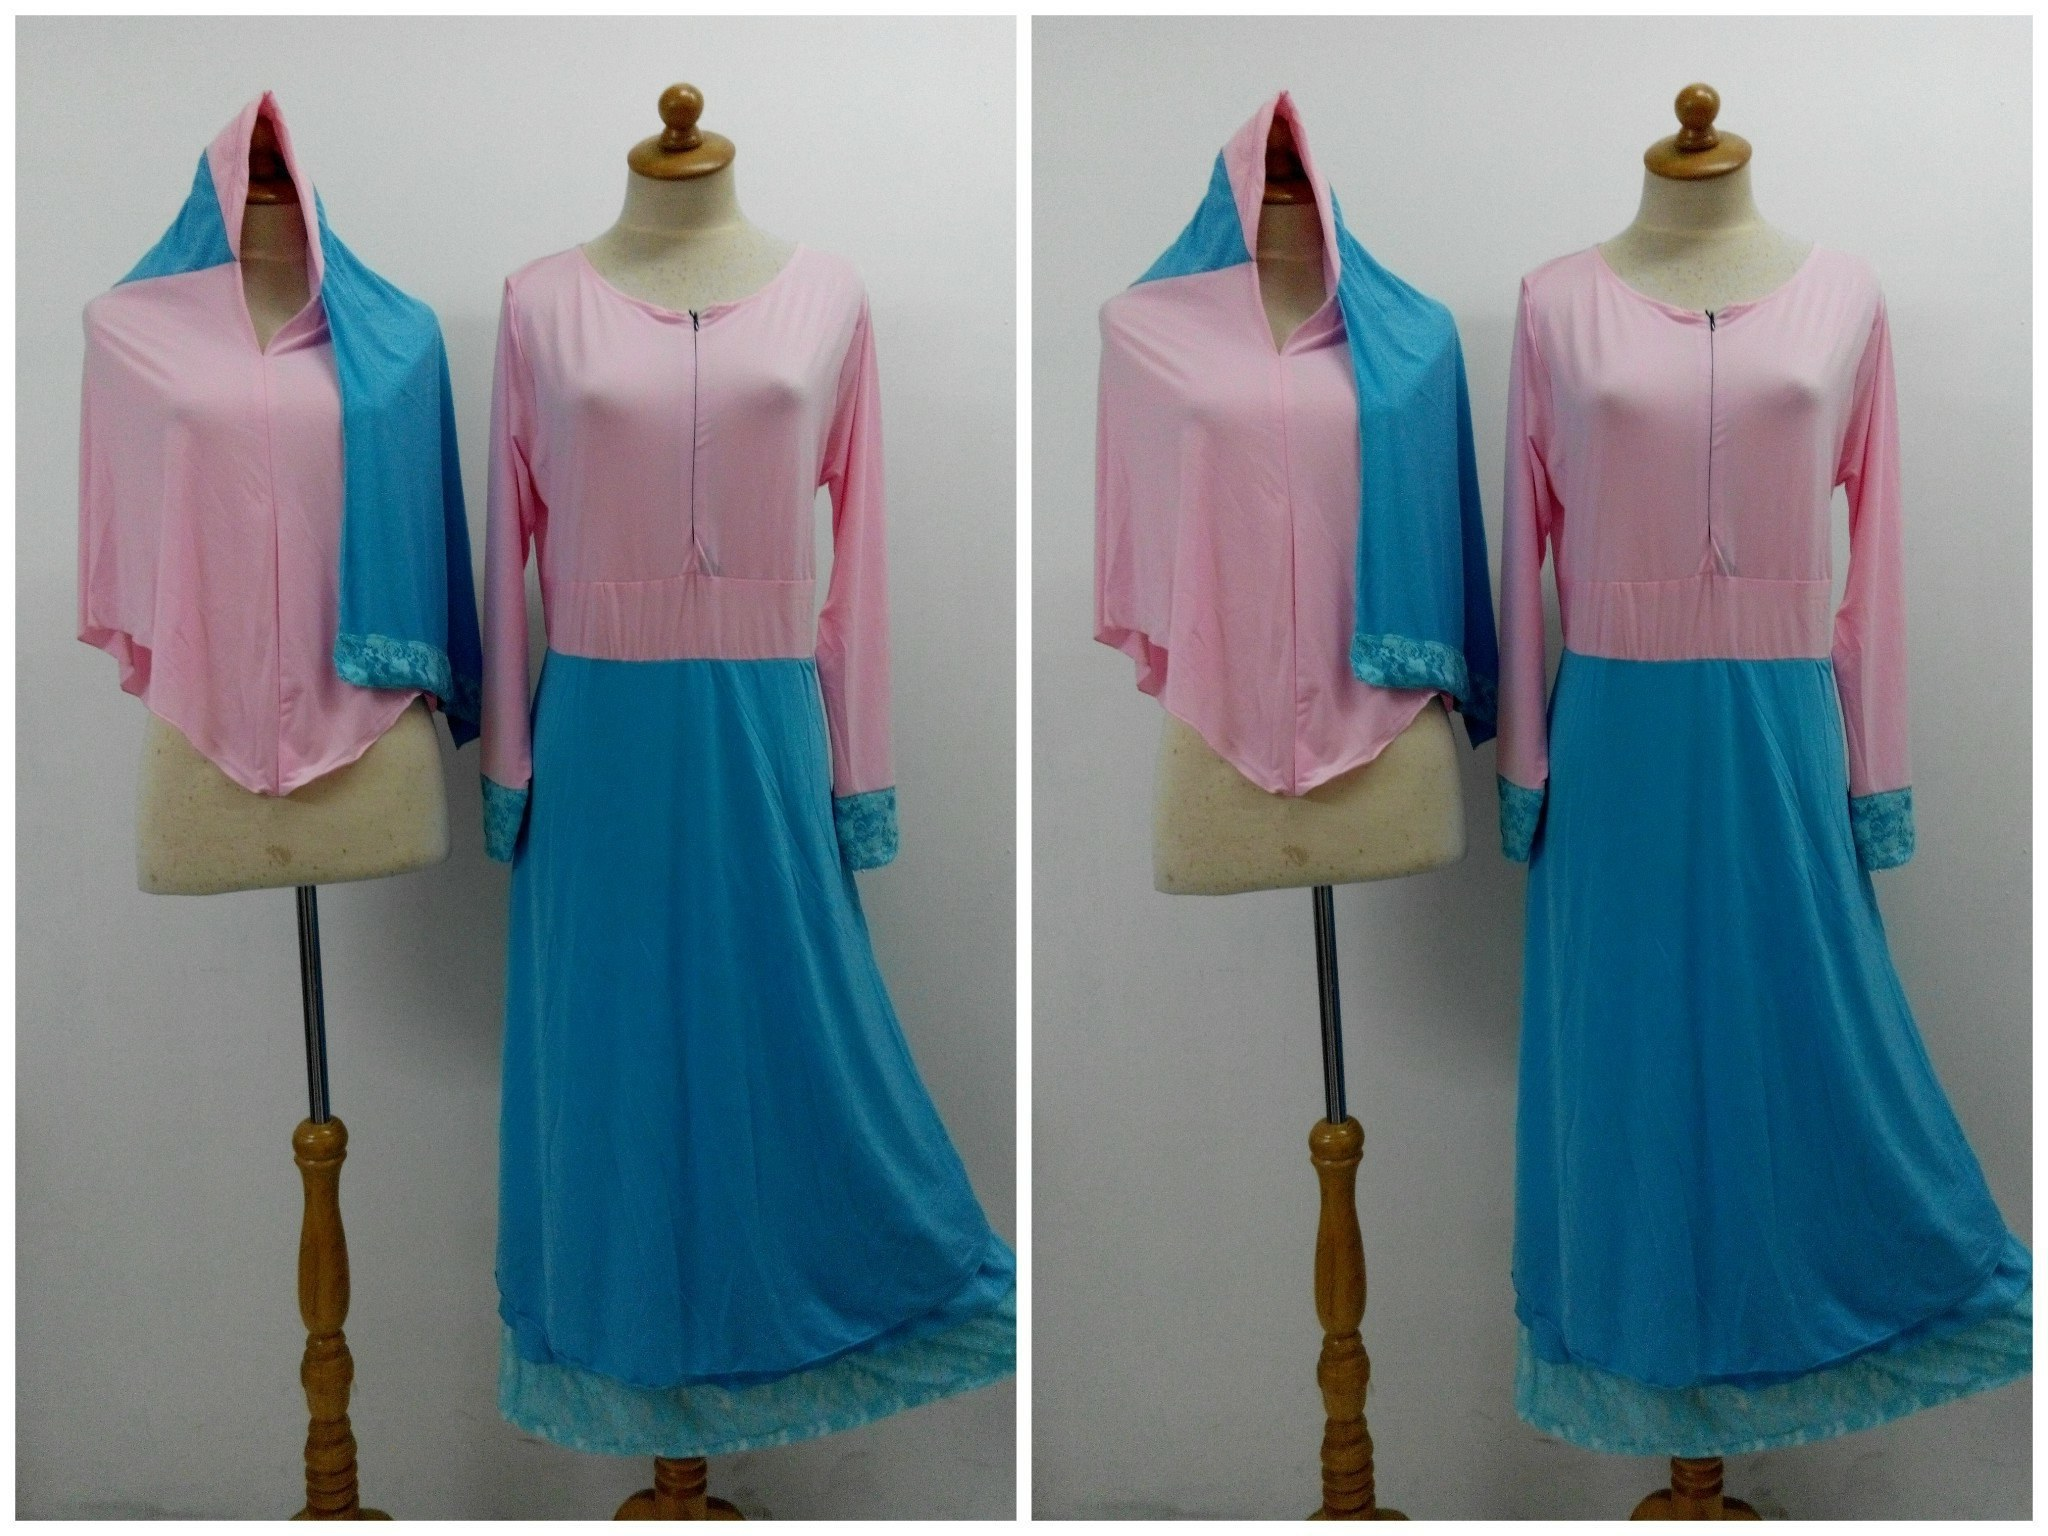 Ide Model Baju Lebaran 2019 Tanah Abang Xtd6 26 Trend Baju Muslim 2020 Tanah Abang Yang Populer